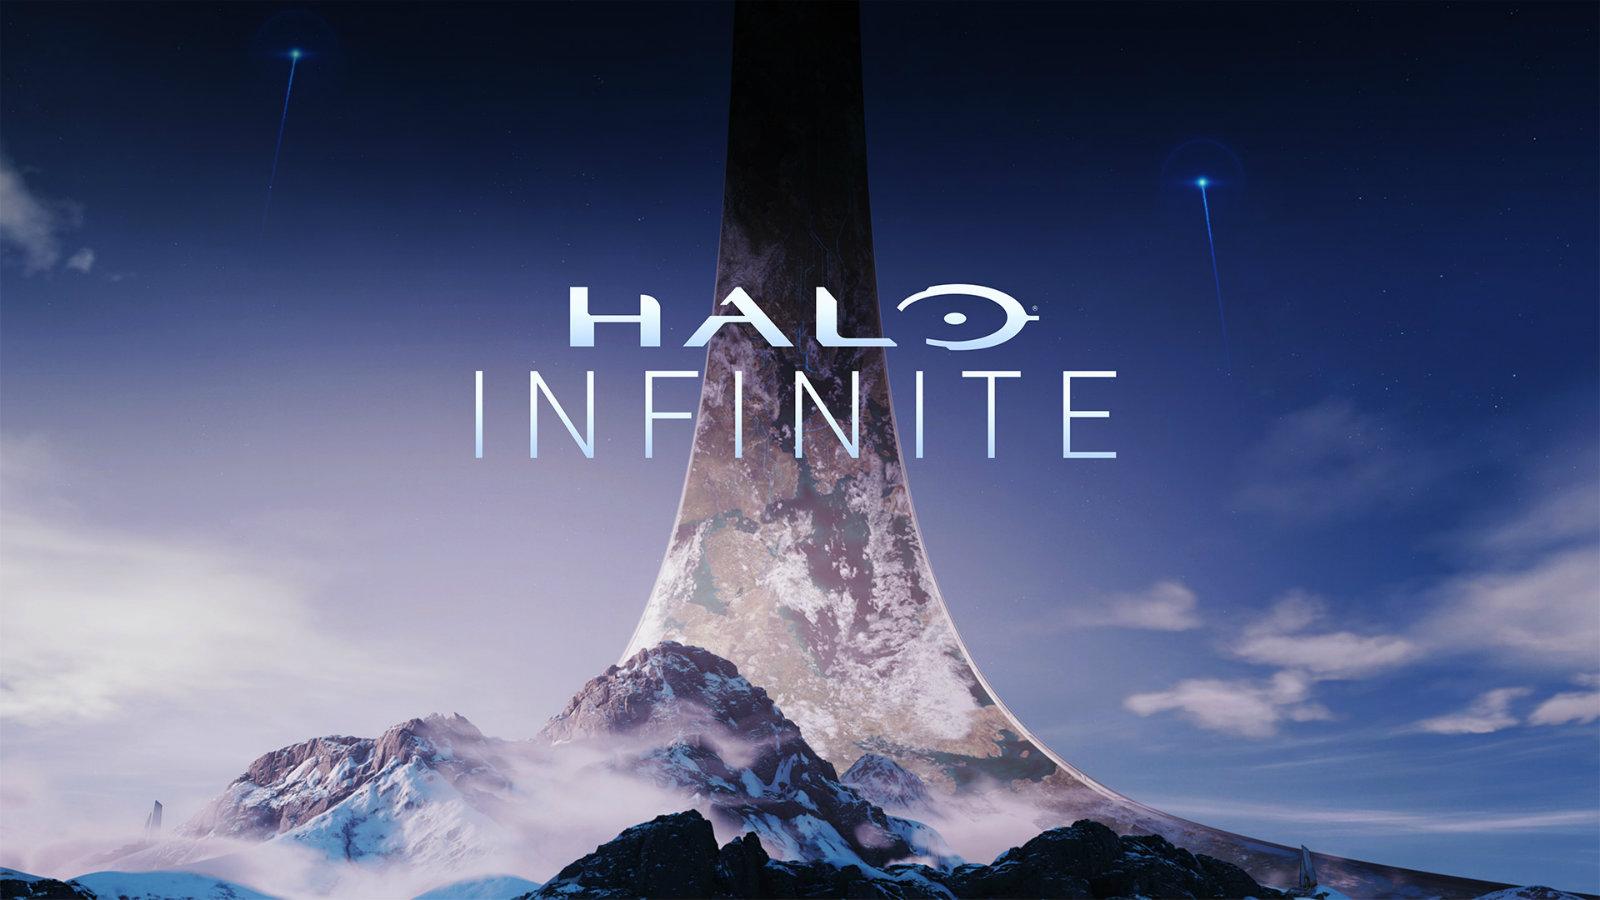 Halo Infinite logo